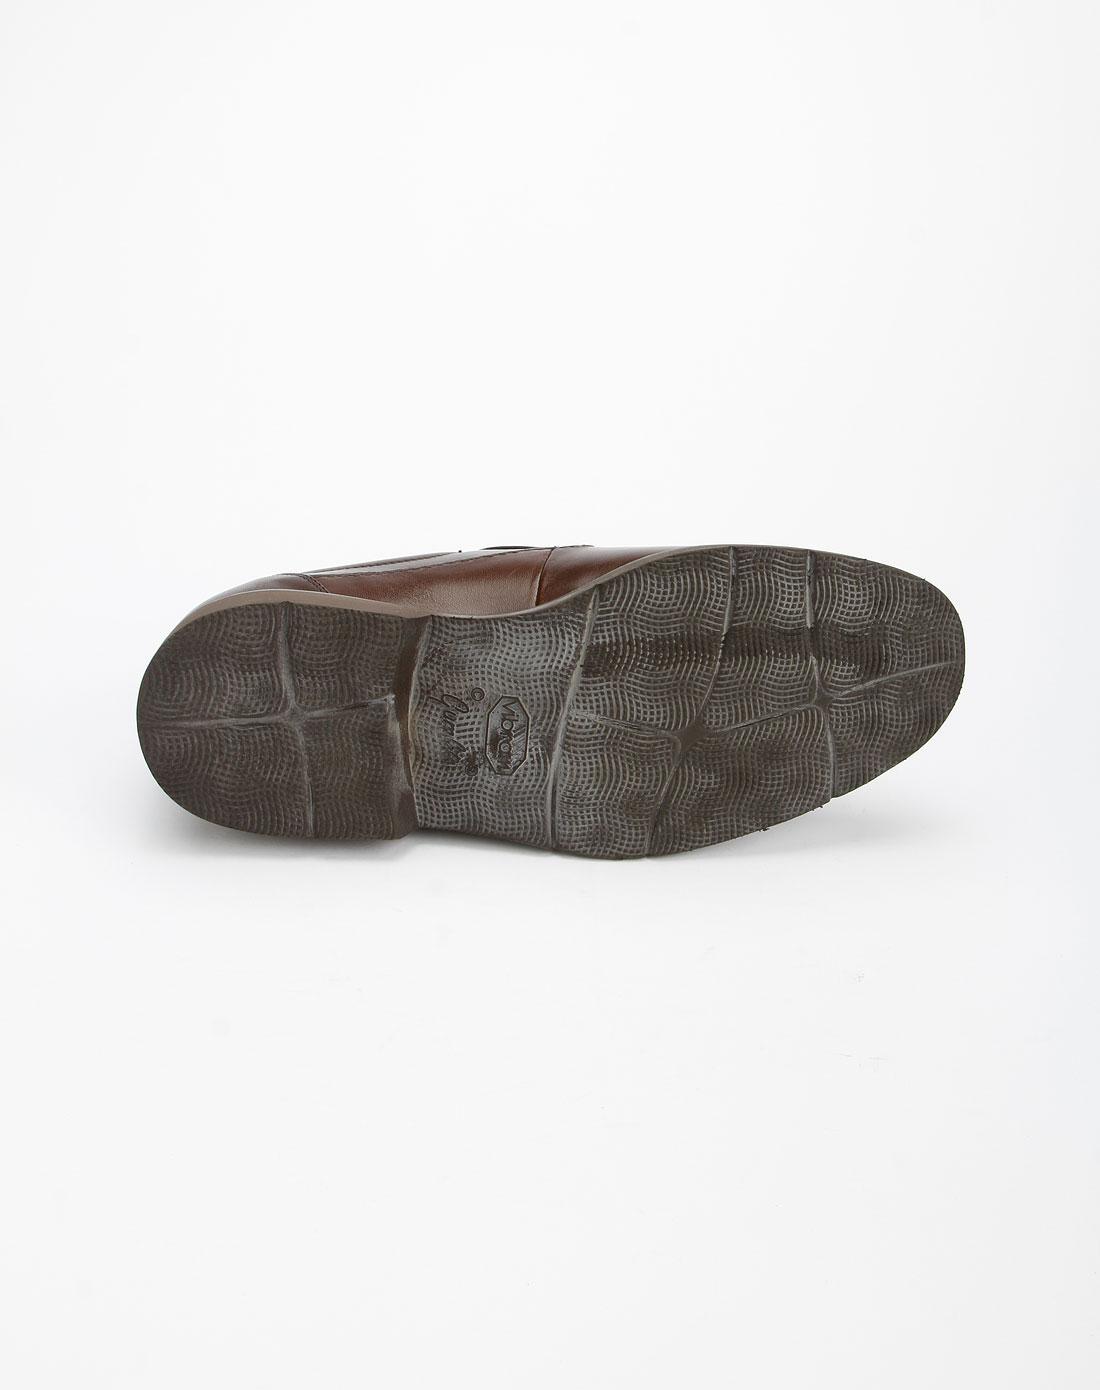 ho男款棕色时尚休闲皮鞋